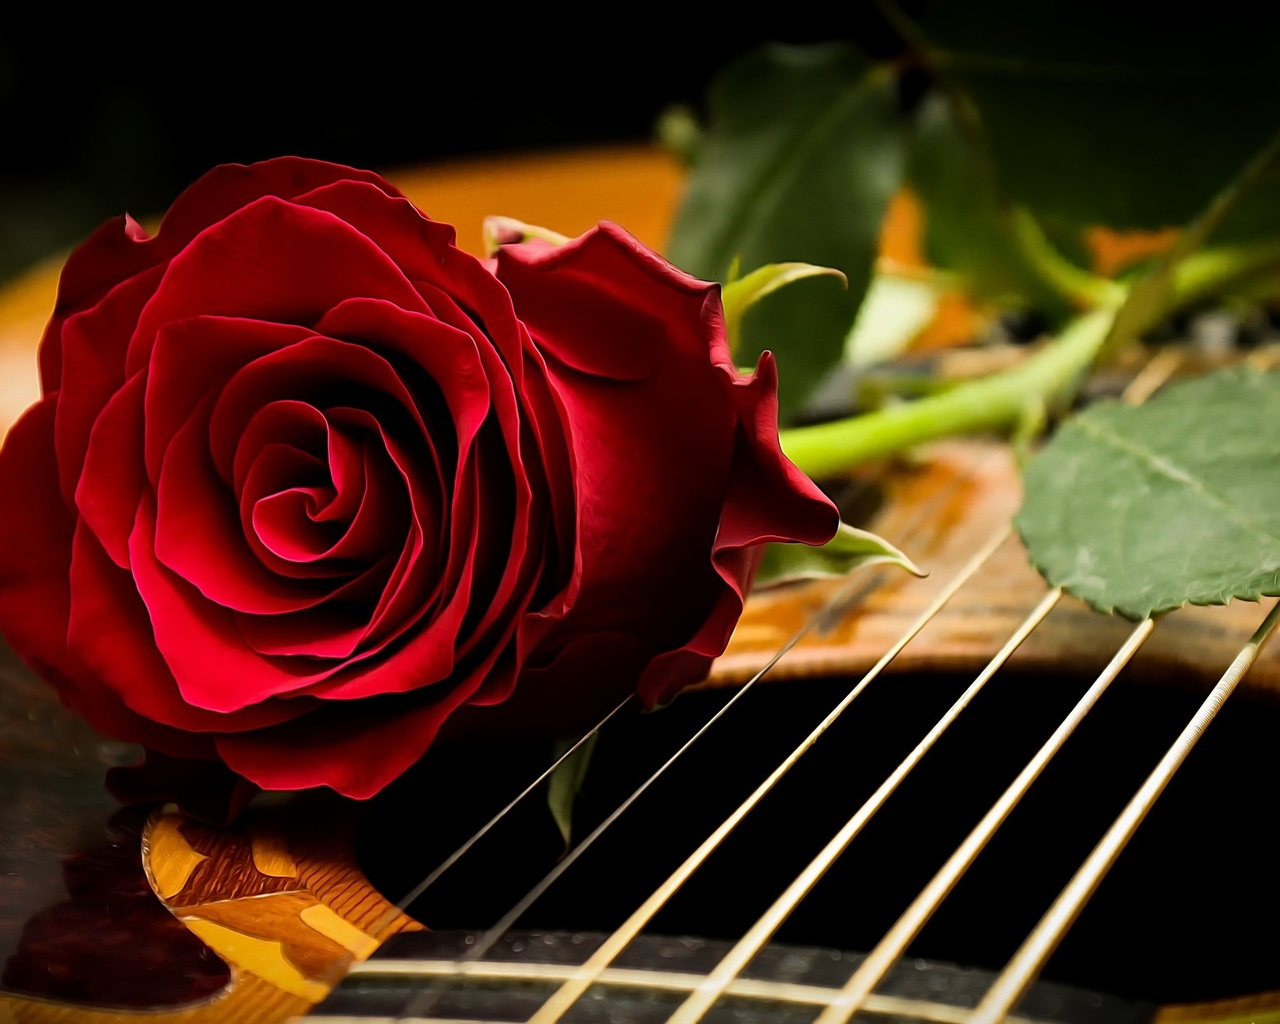 цветок, роза, струны, гитара